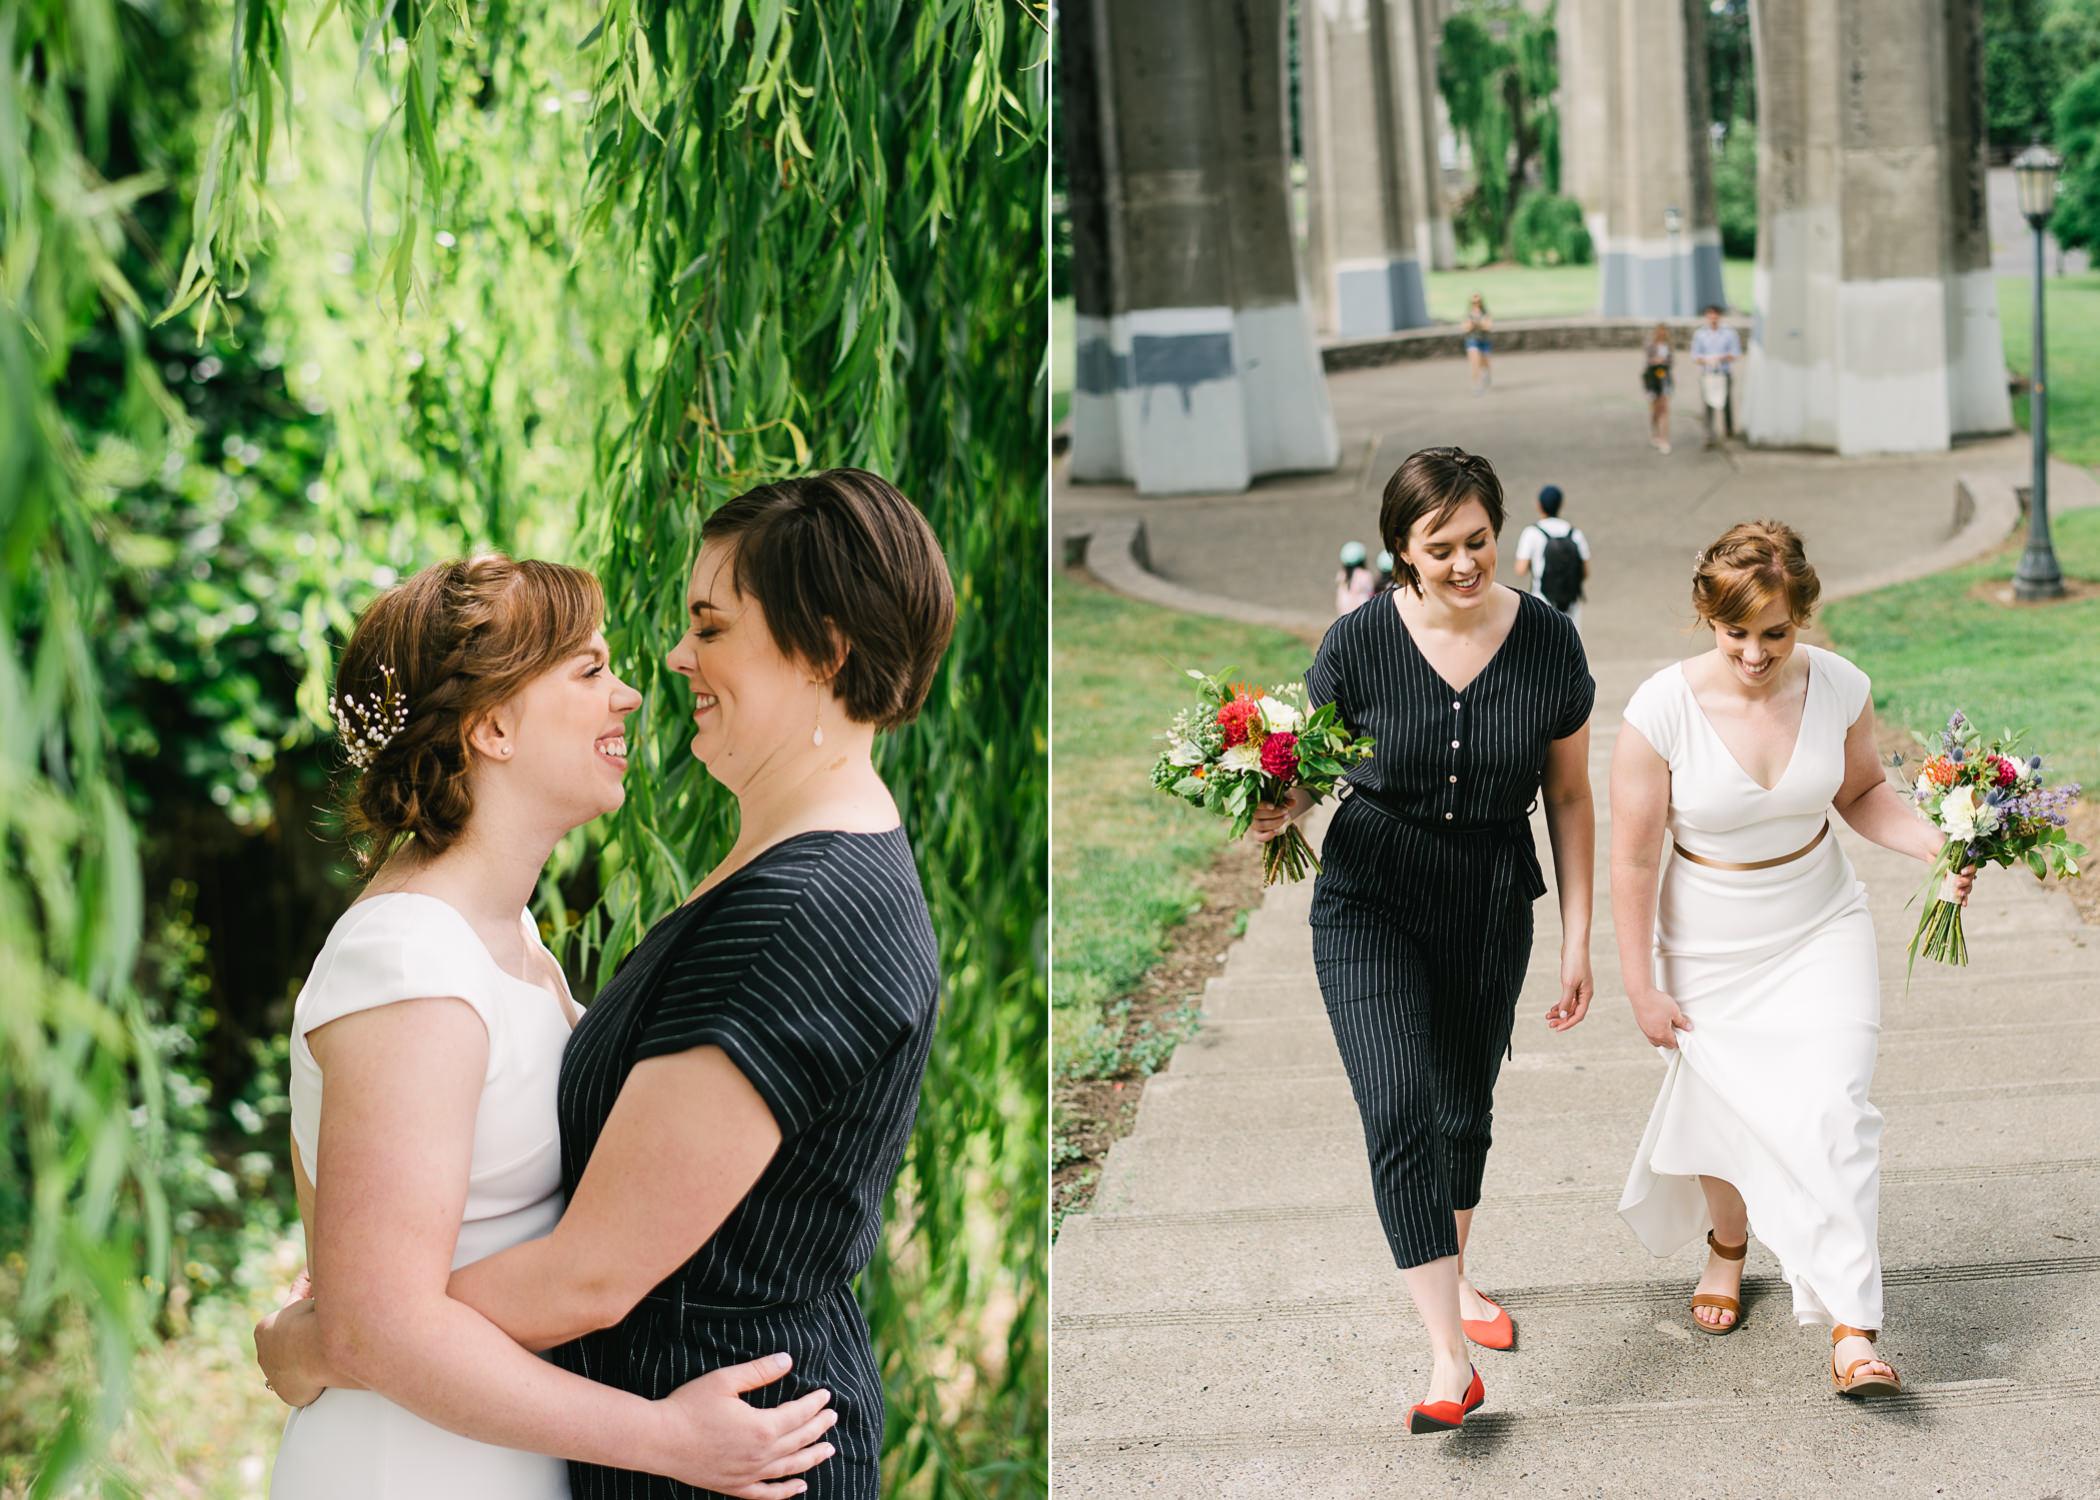 cathedral-park-portland-elopement-gay-wedding-058.JPG